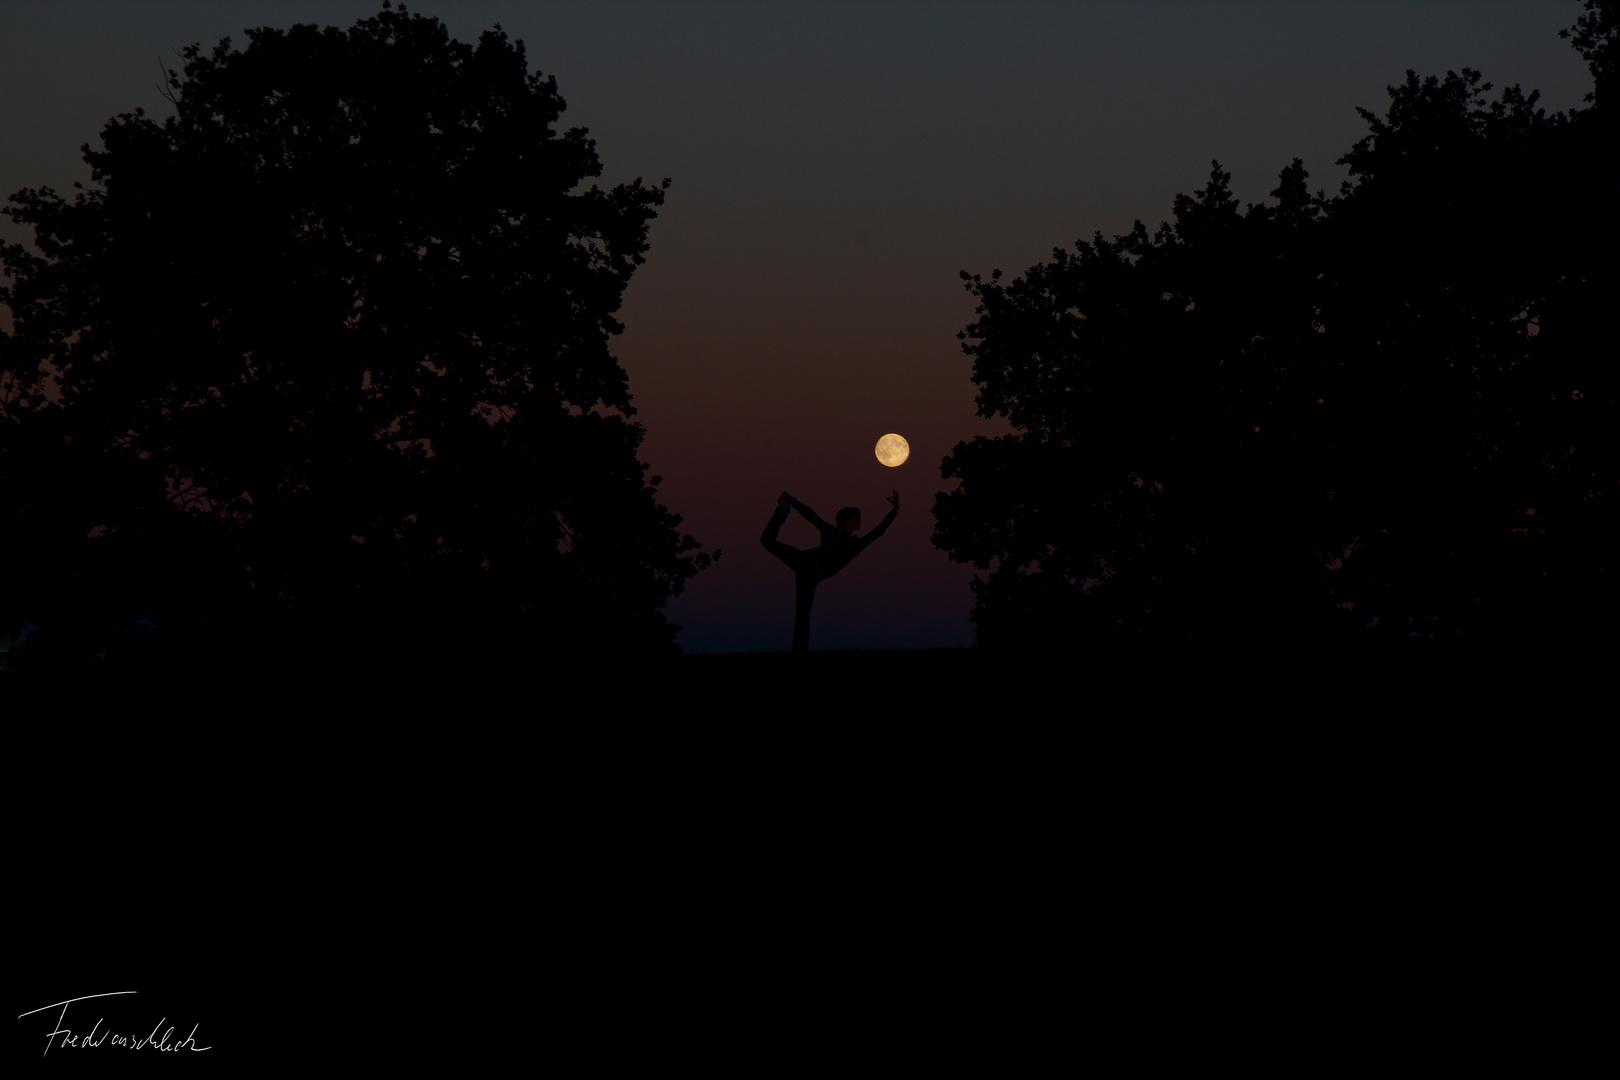 Mondgruß